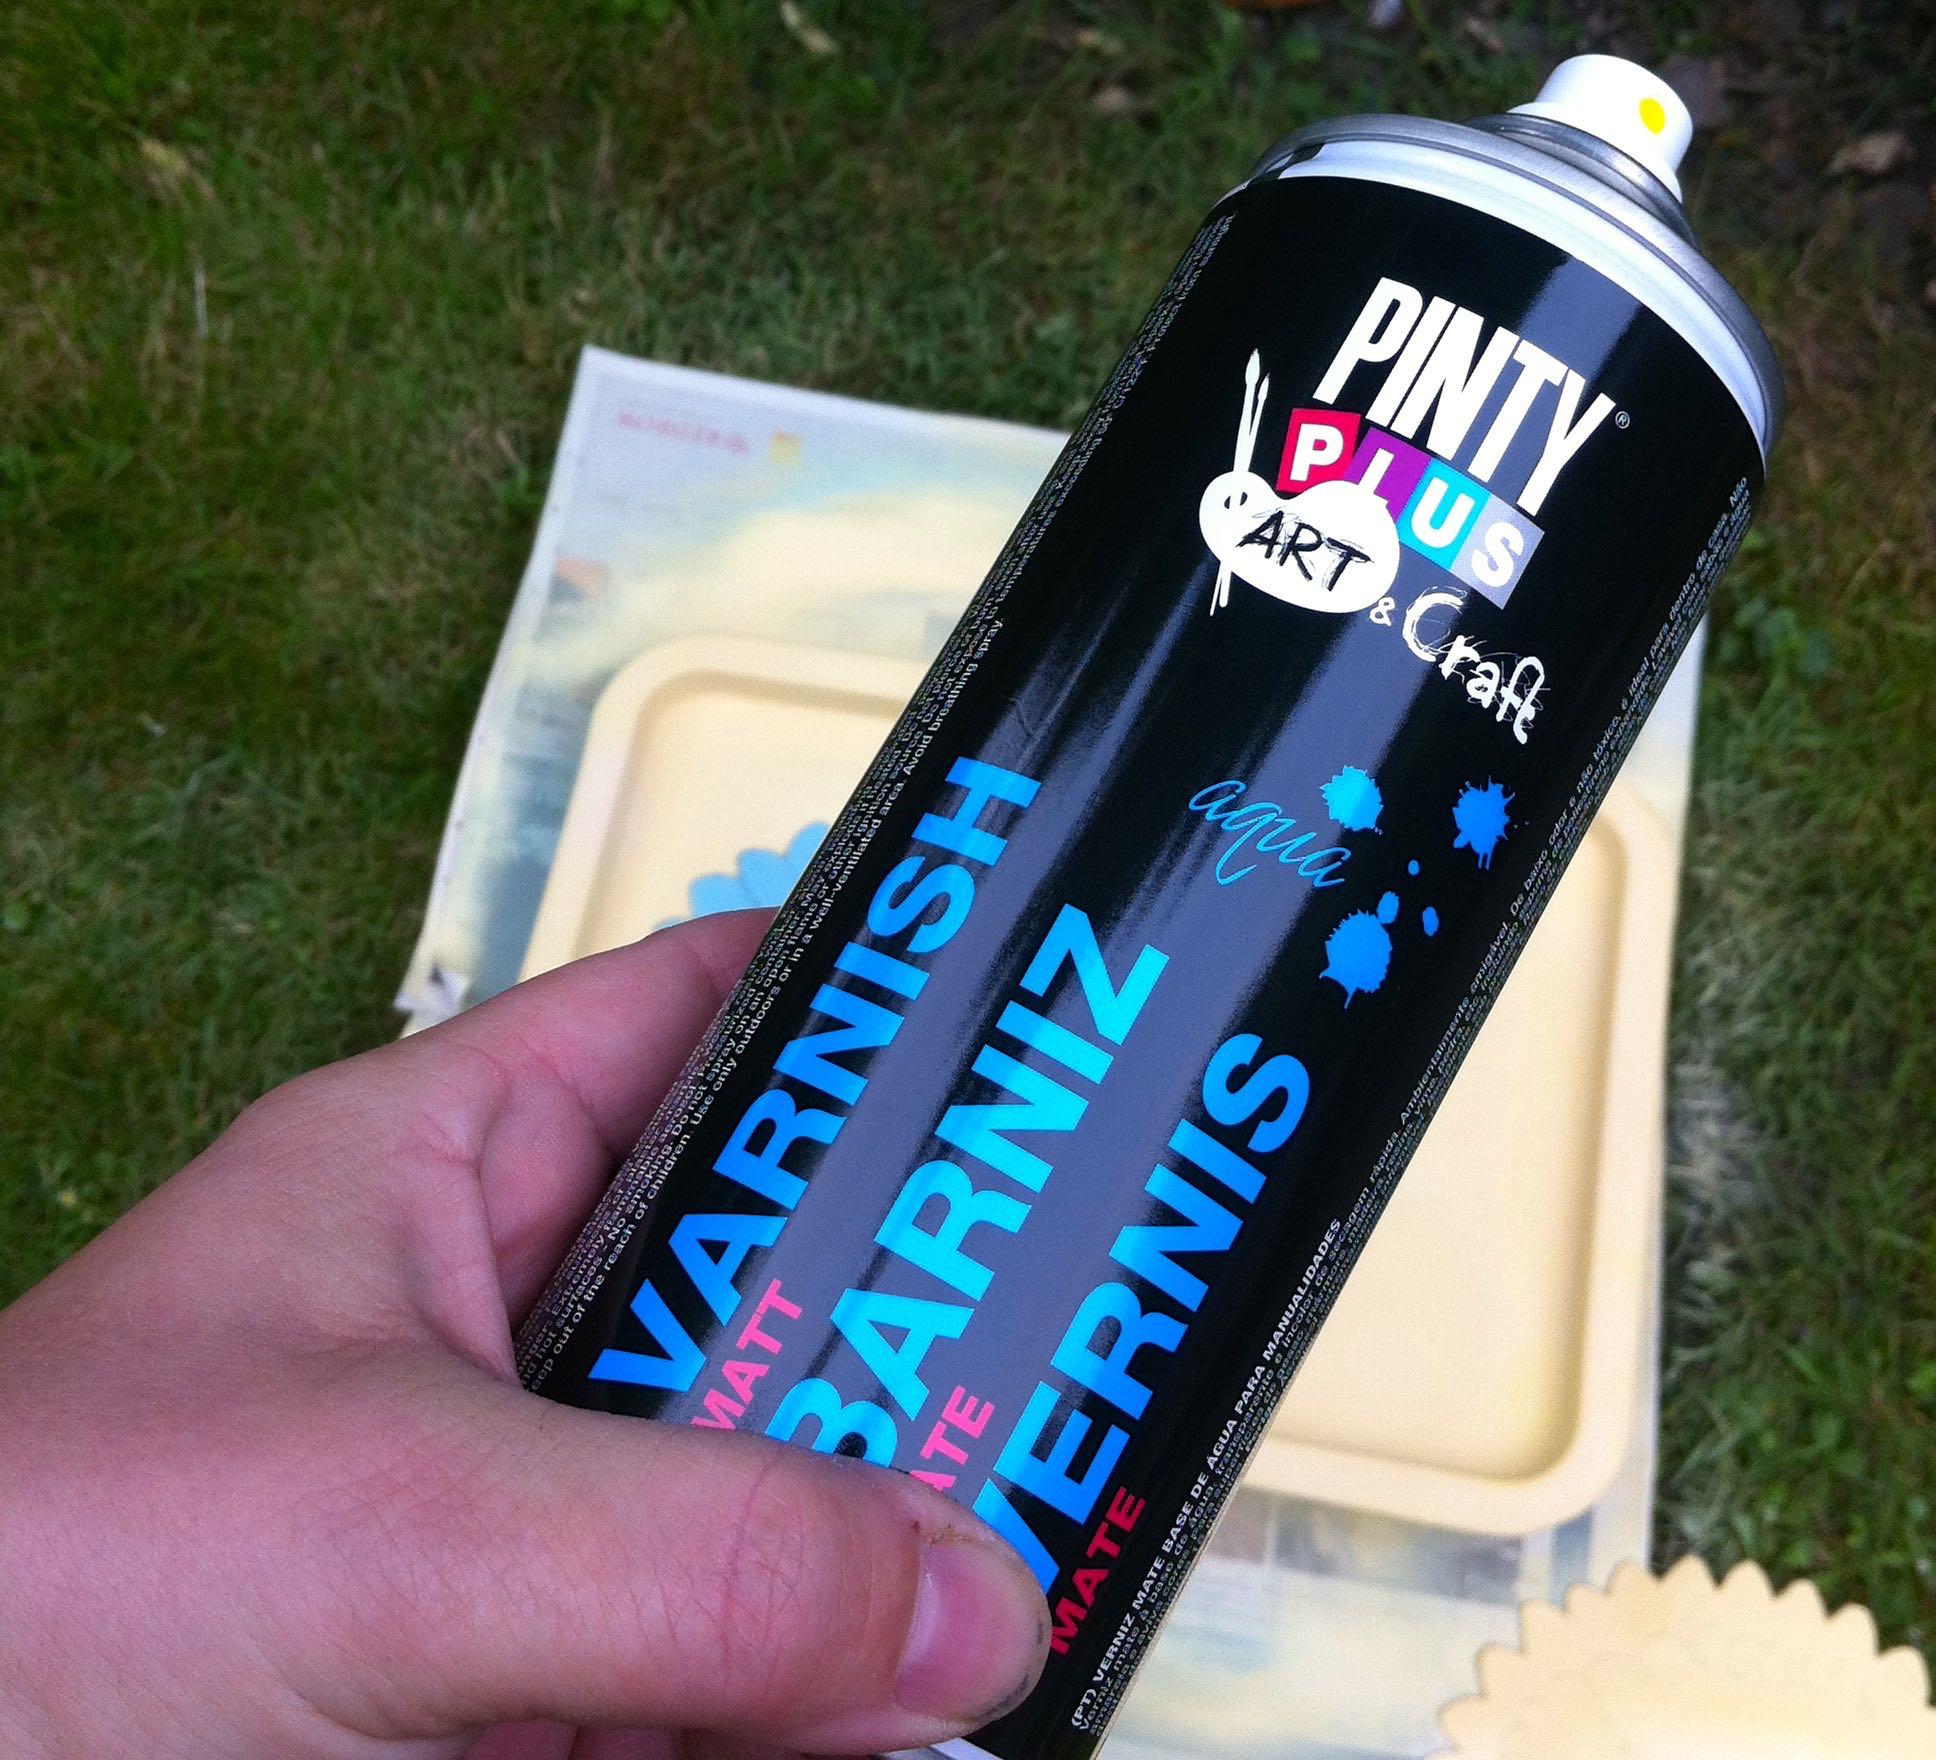 Pinty Plus Matt Varnish Spray